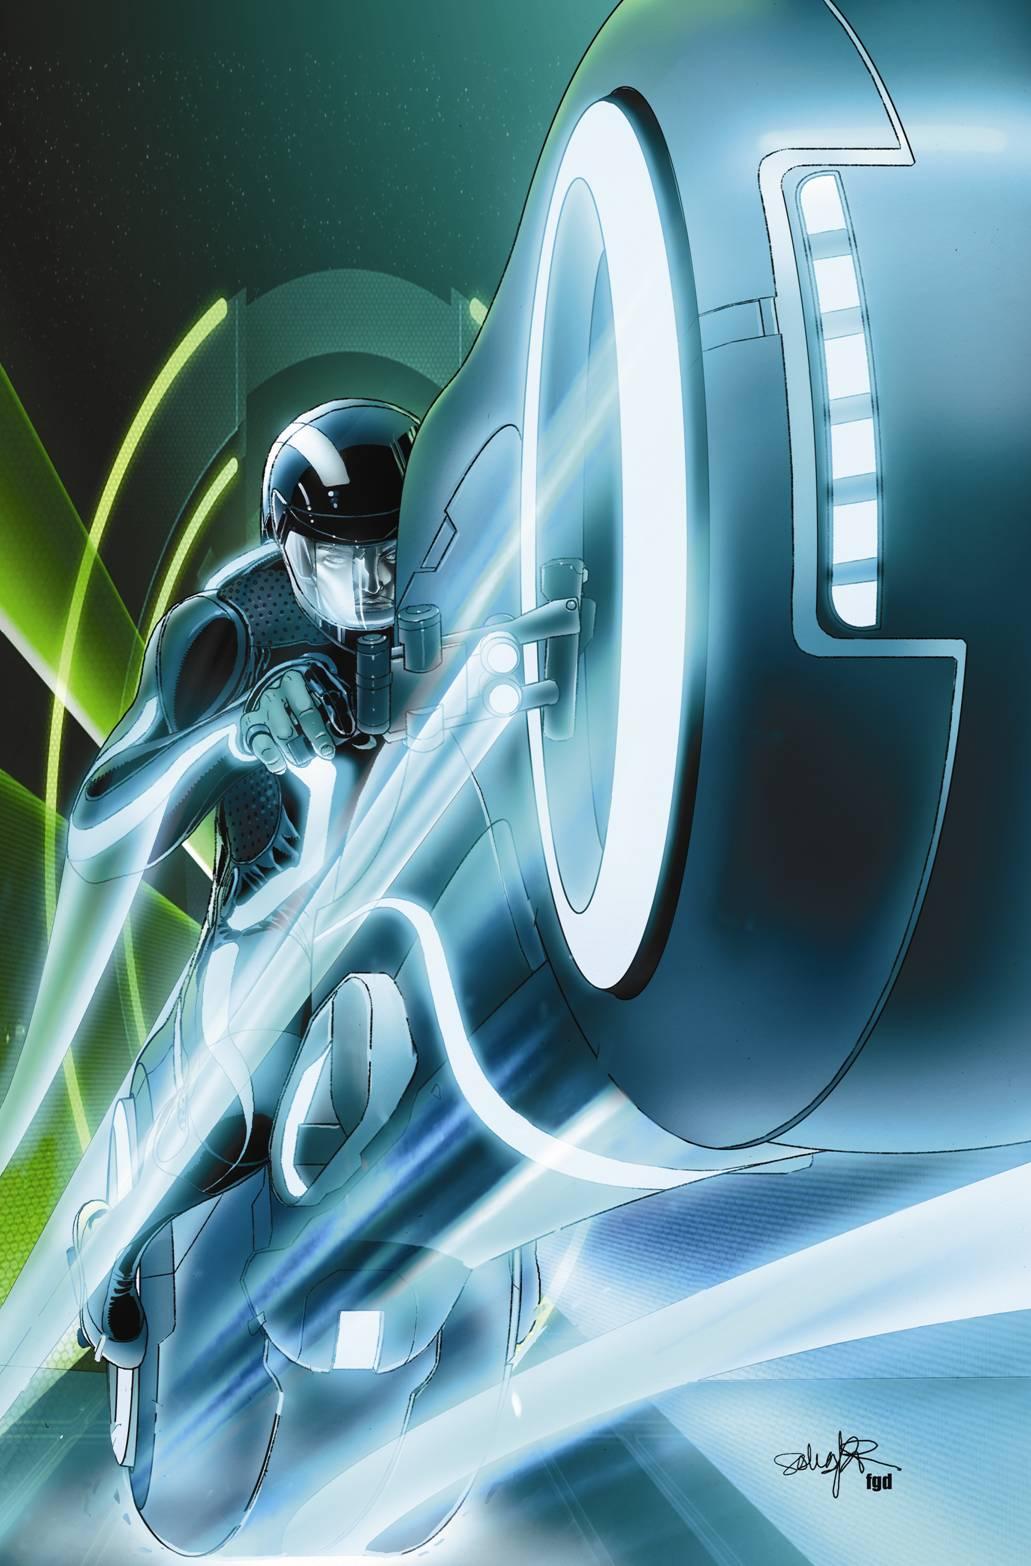 Tron: Betrayal (2010) #2